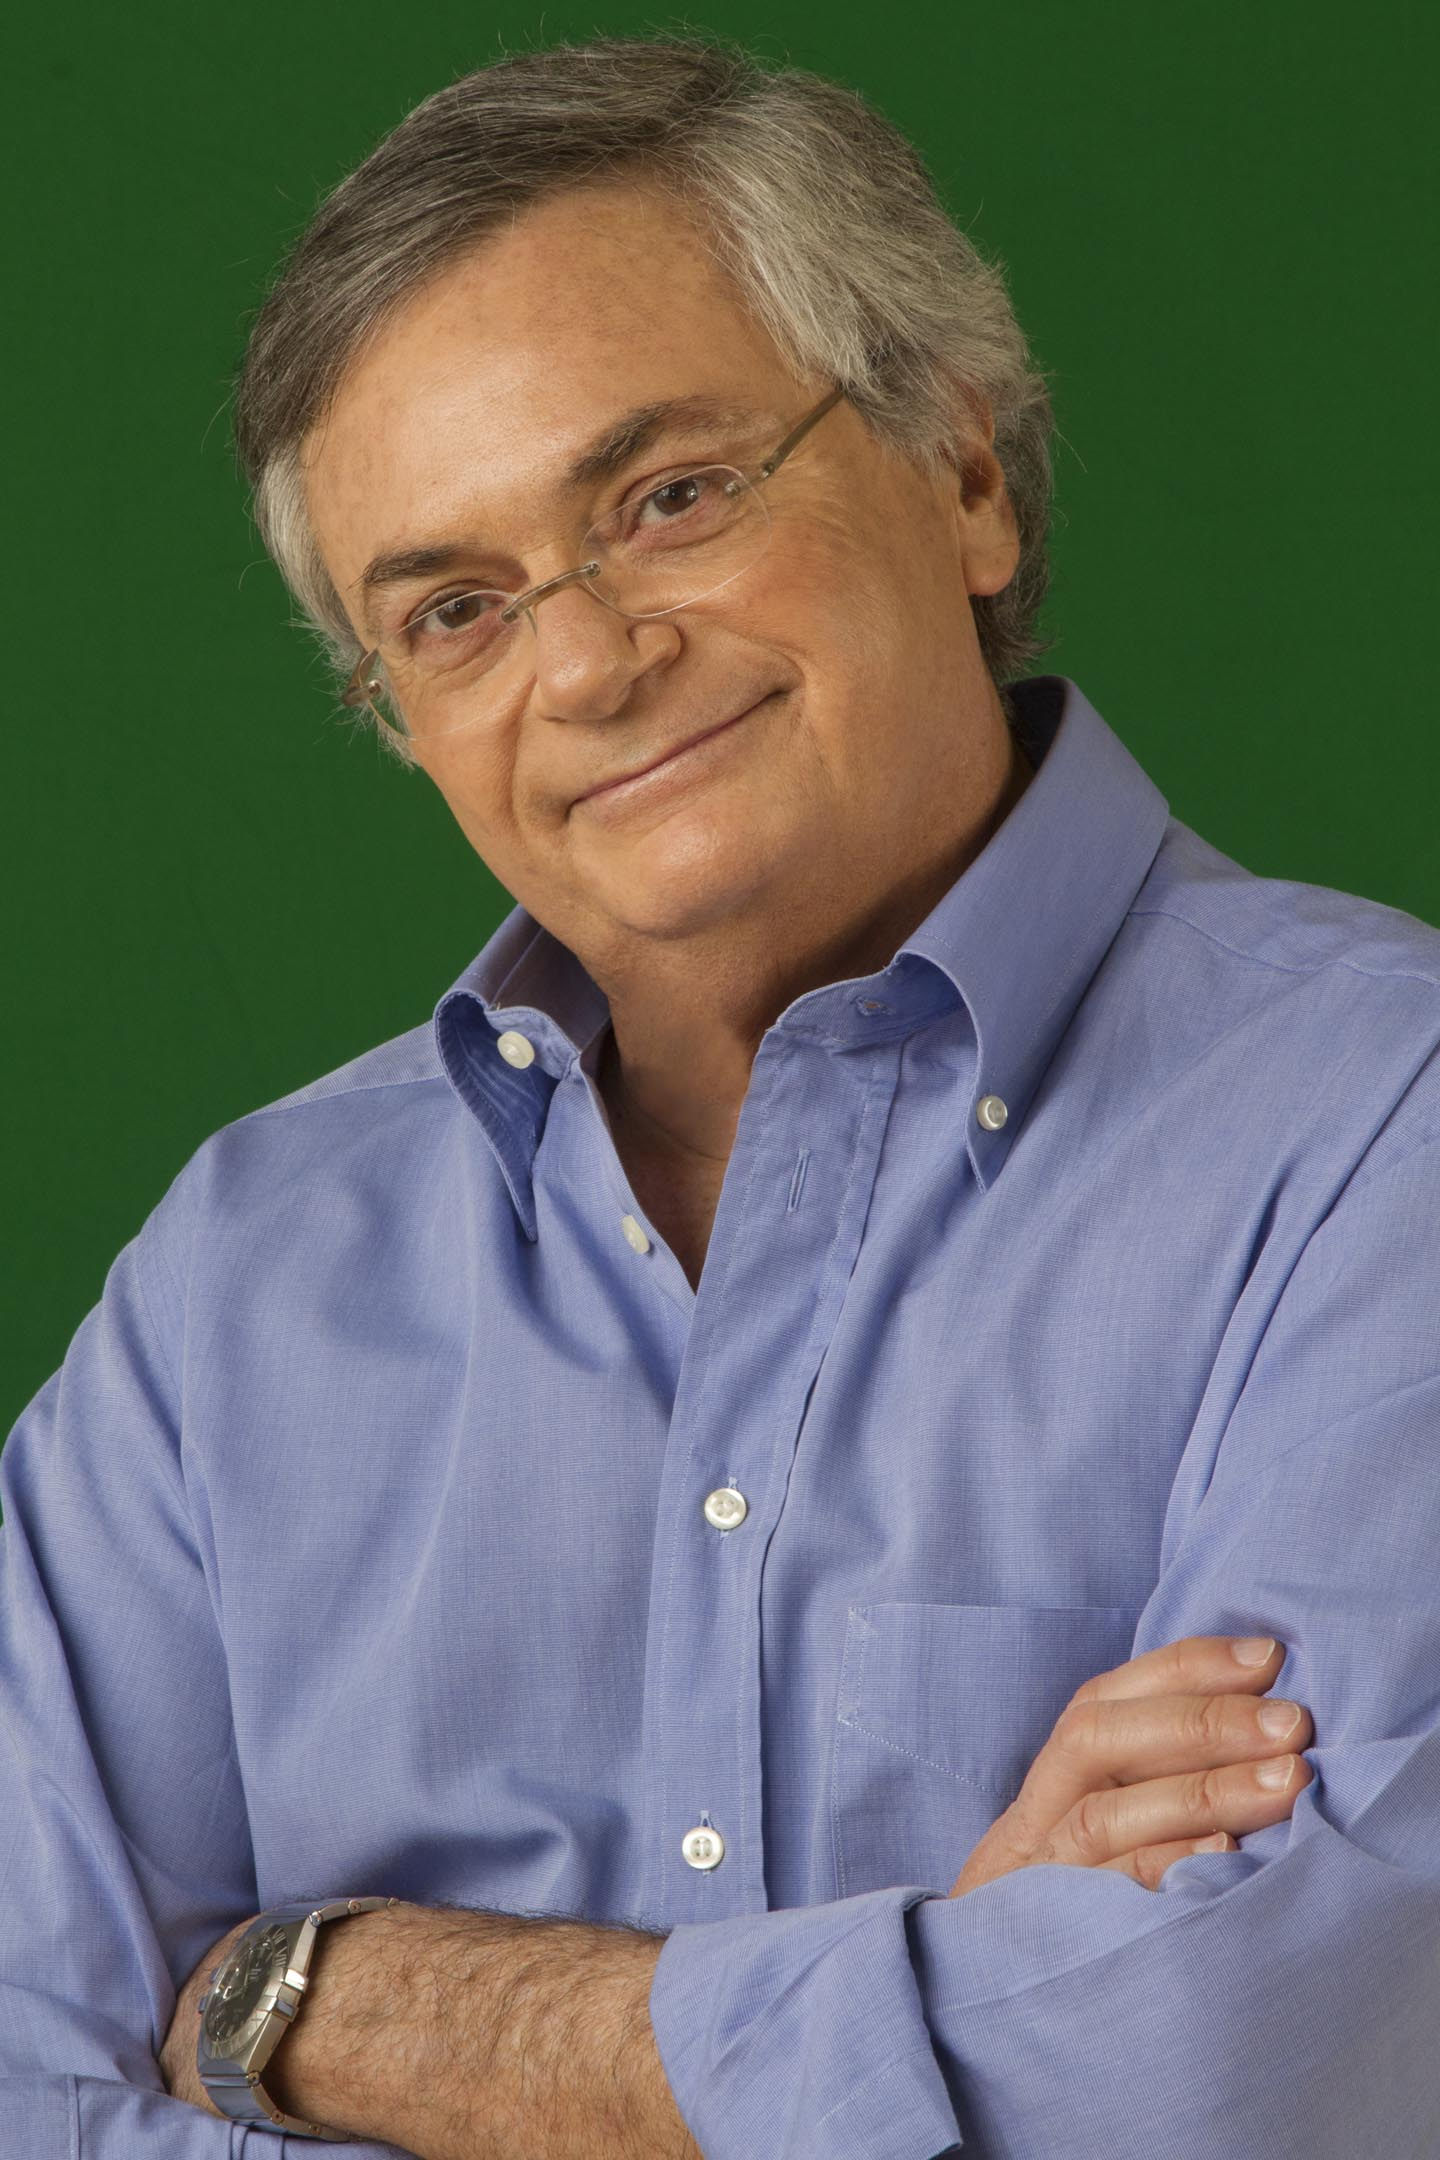 Moisés Naím, Founder & Chairman